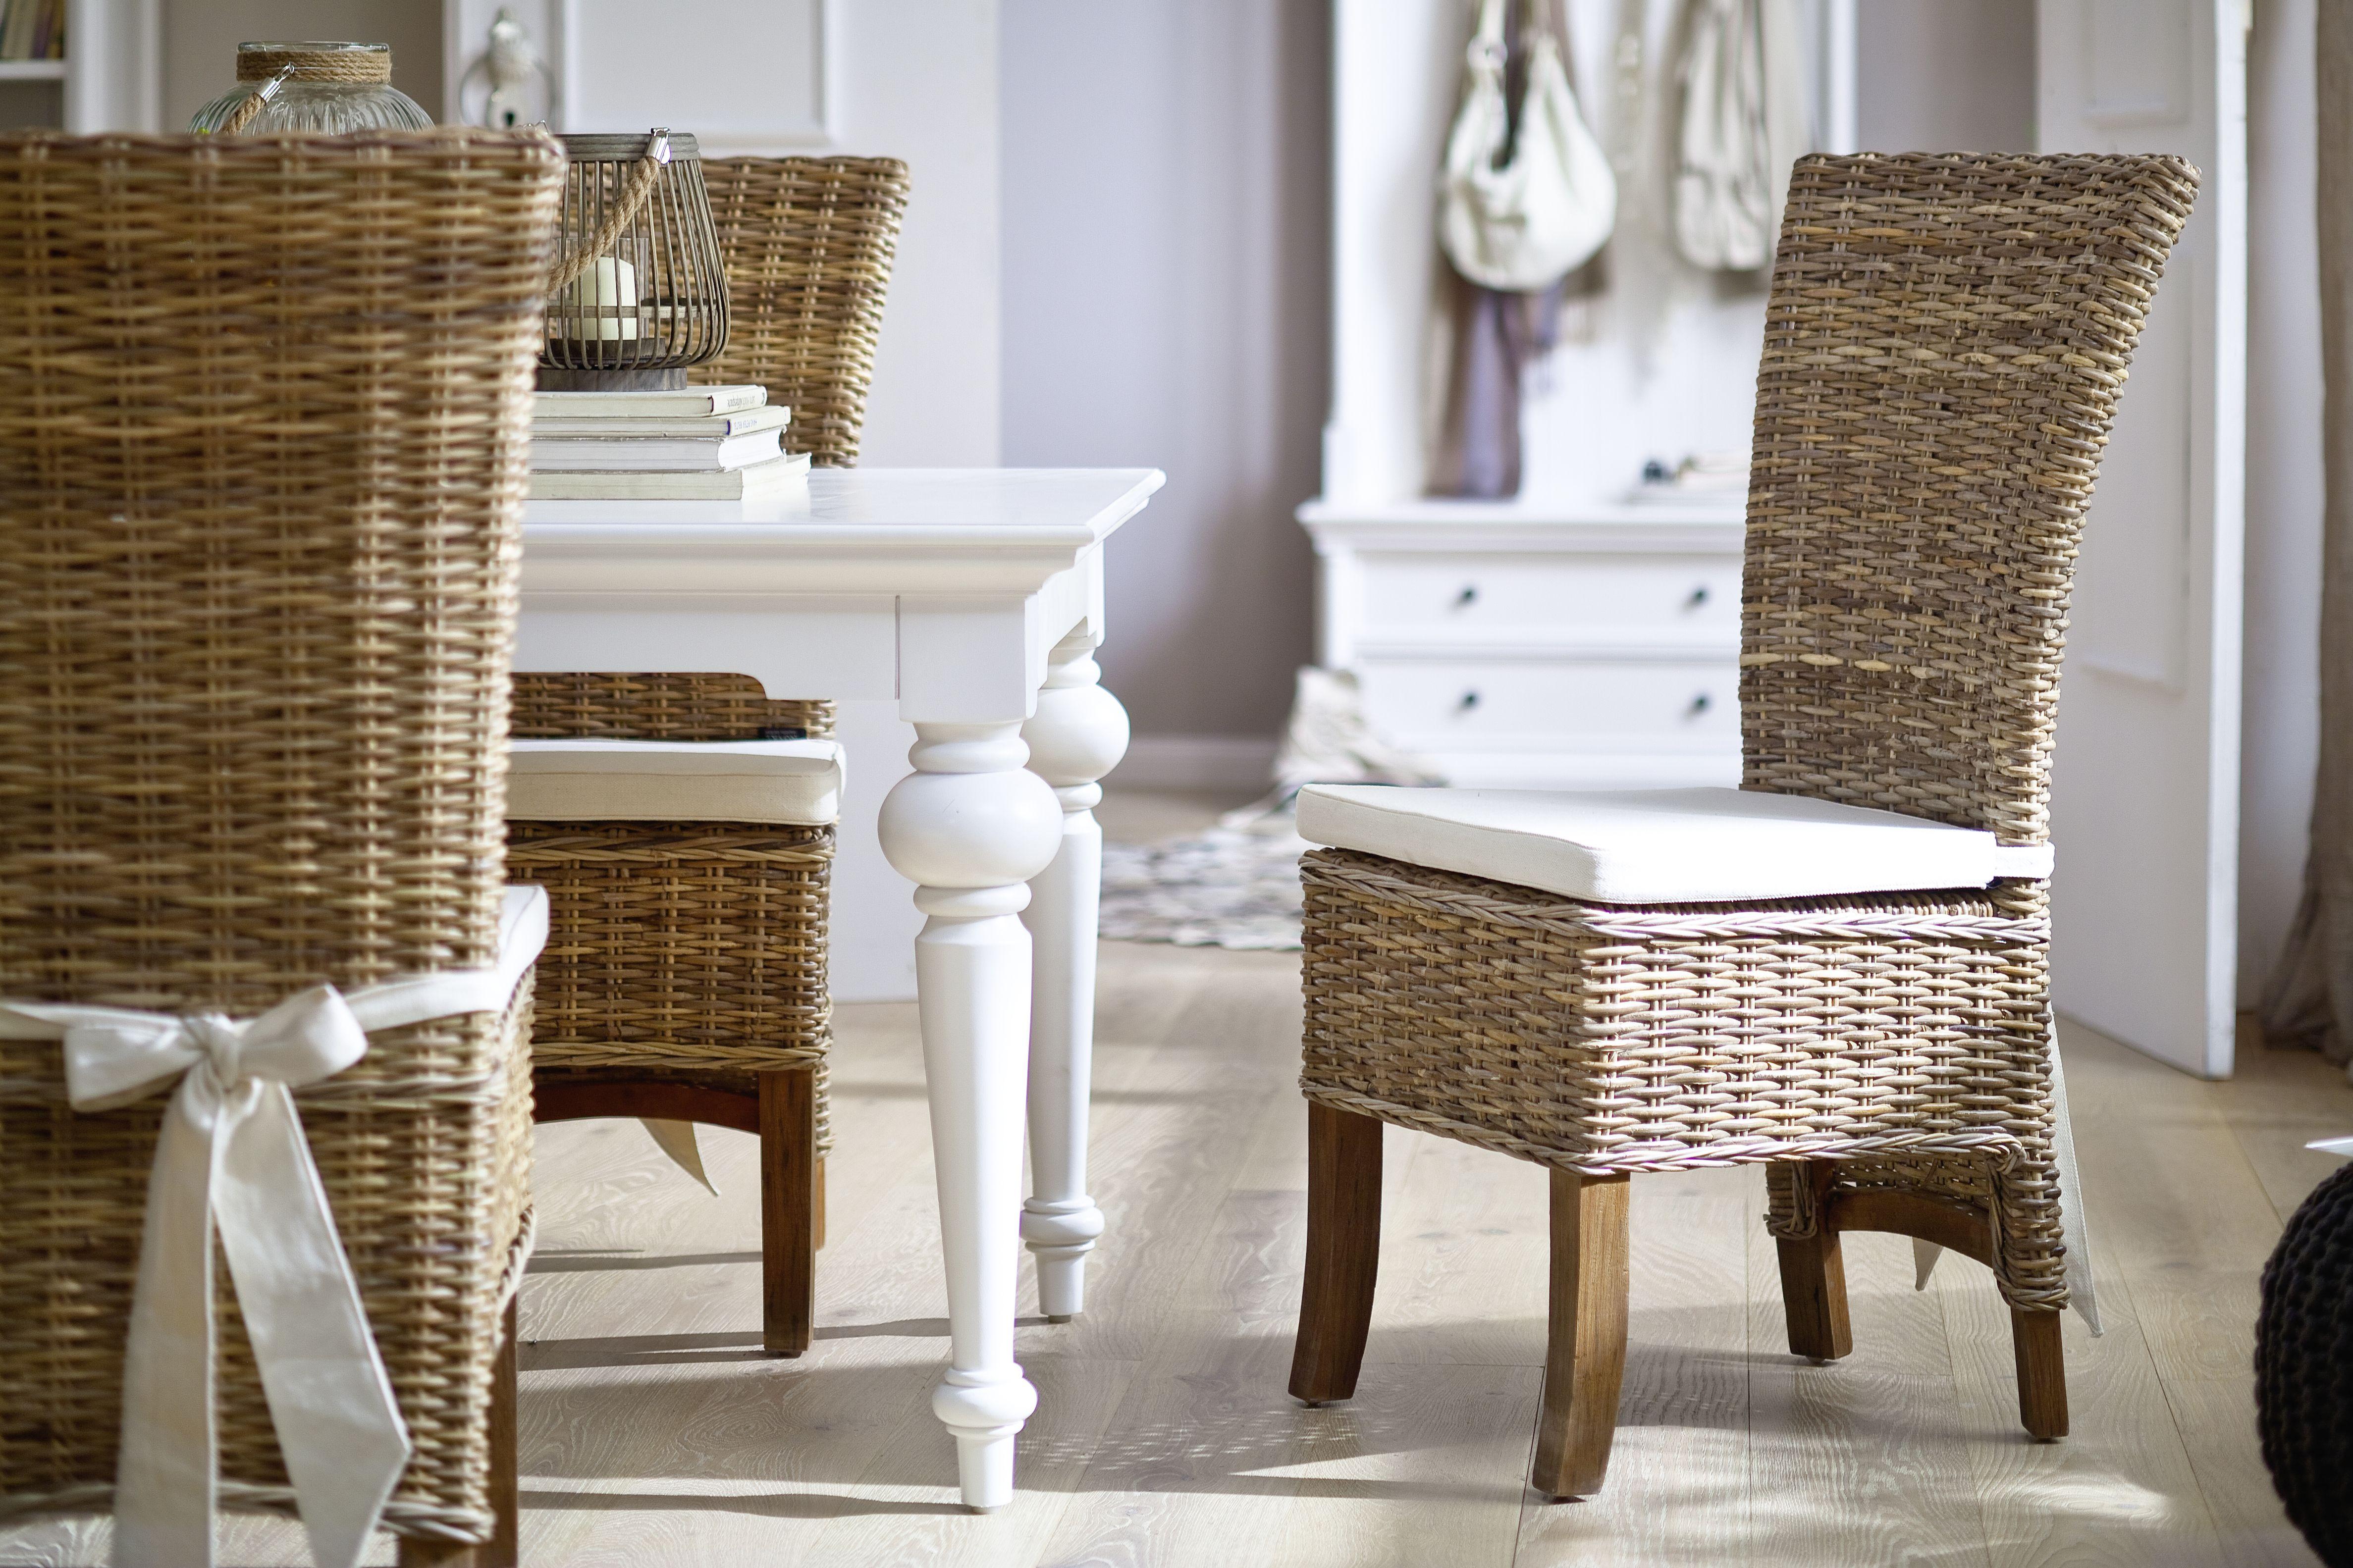 Idee Chambre Bebe Rouge : Indogatecom  Maison Moderne Diningchair